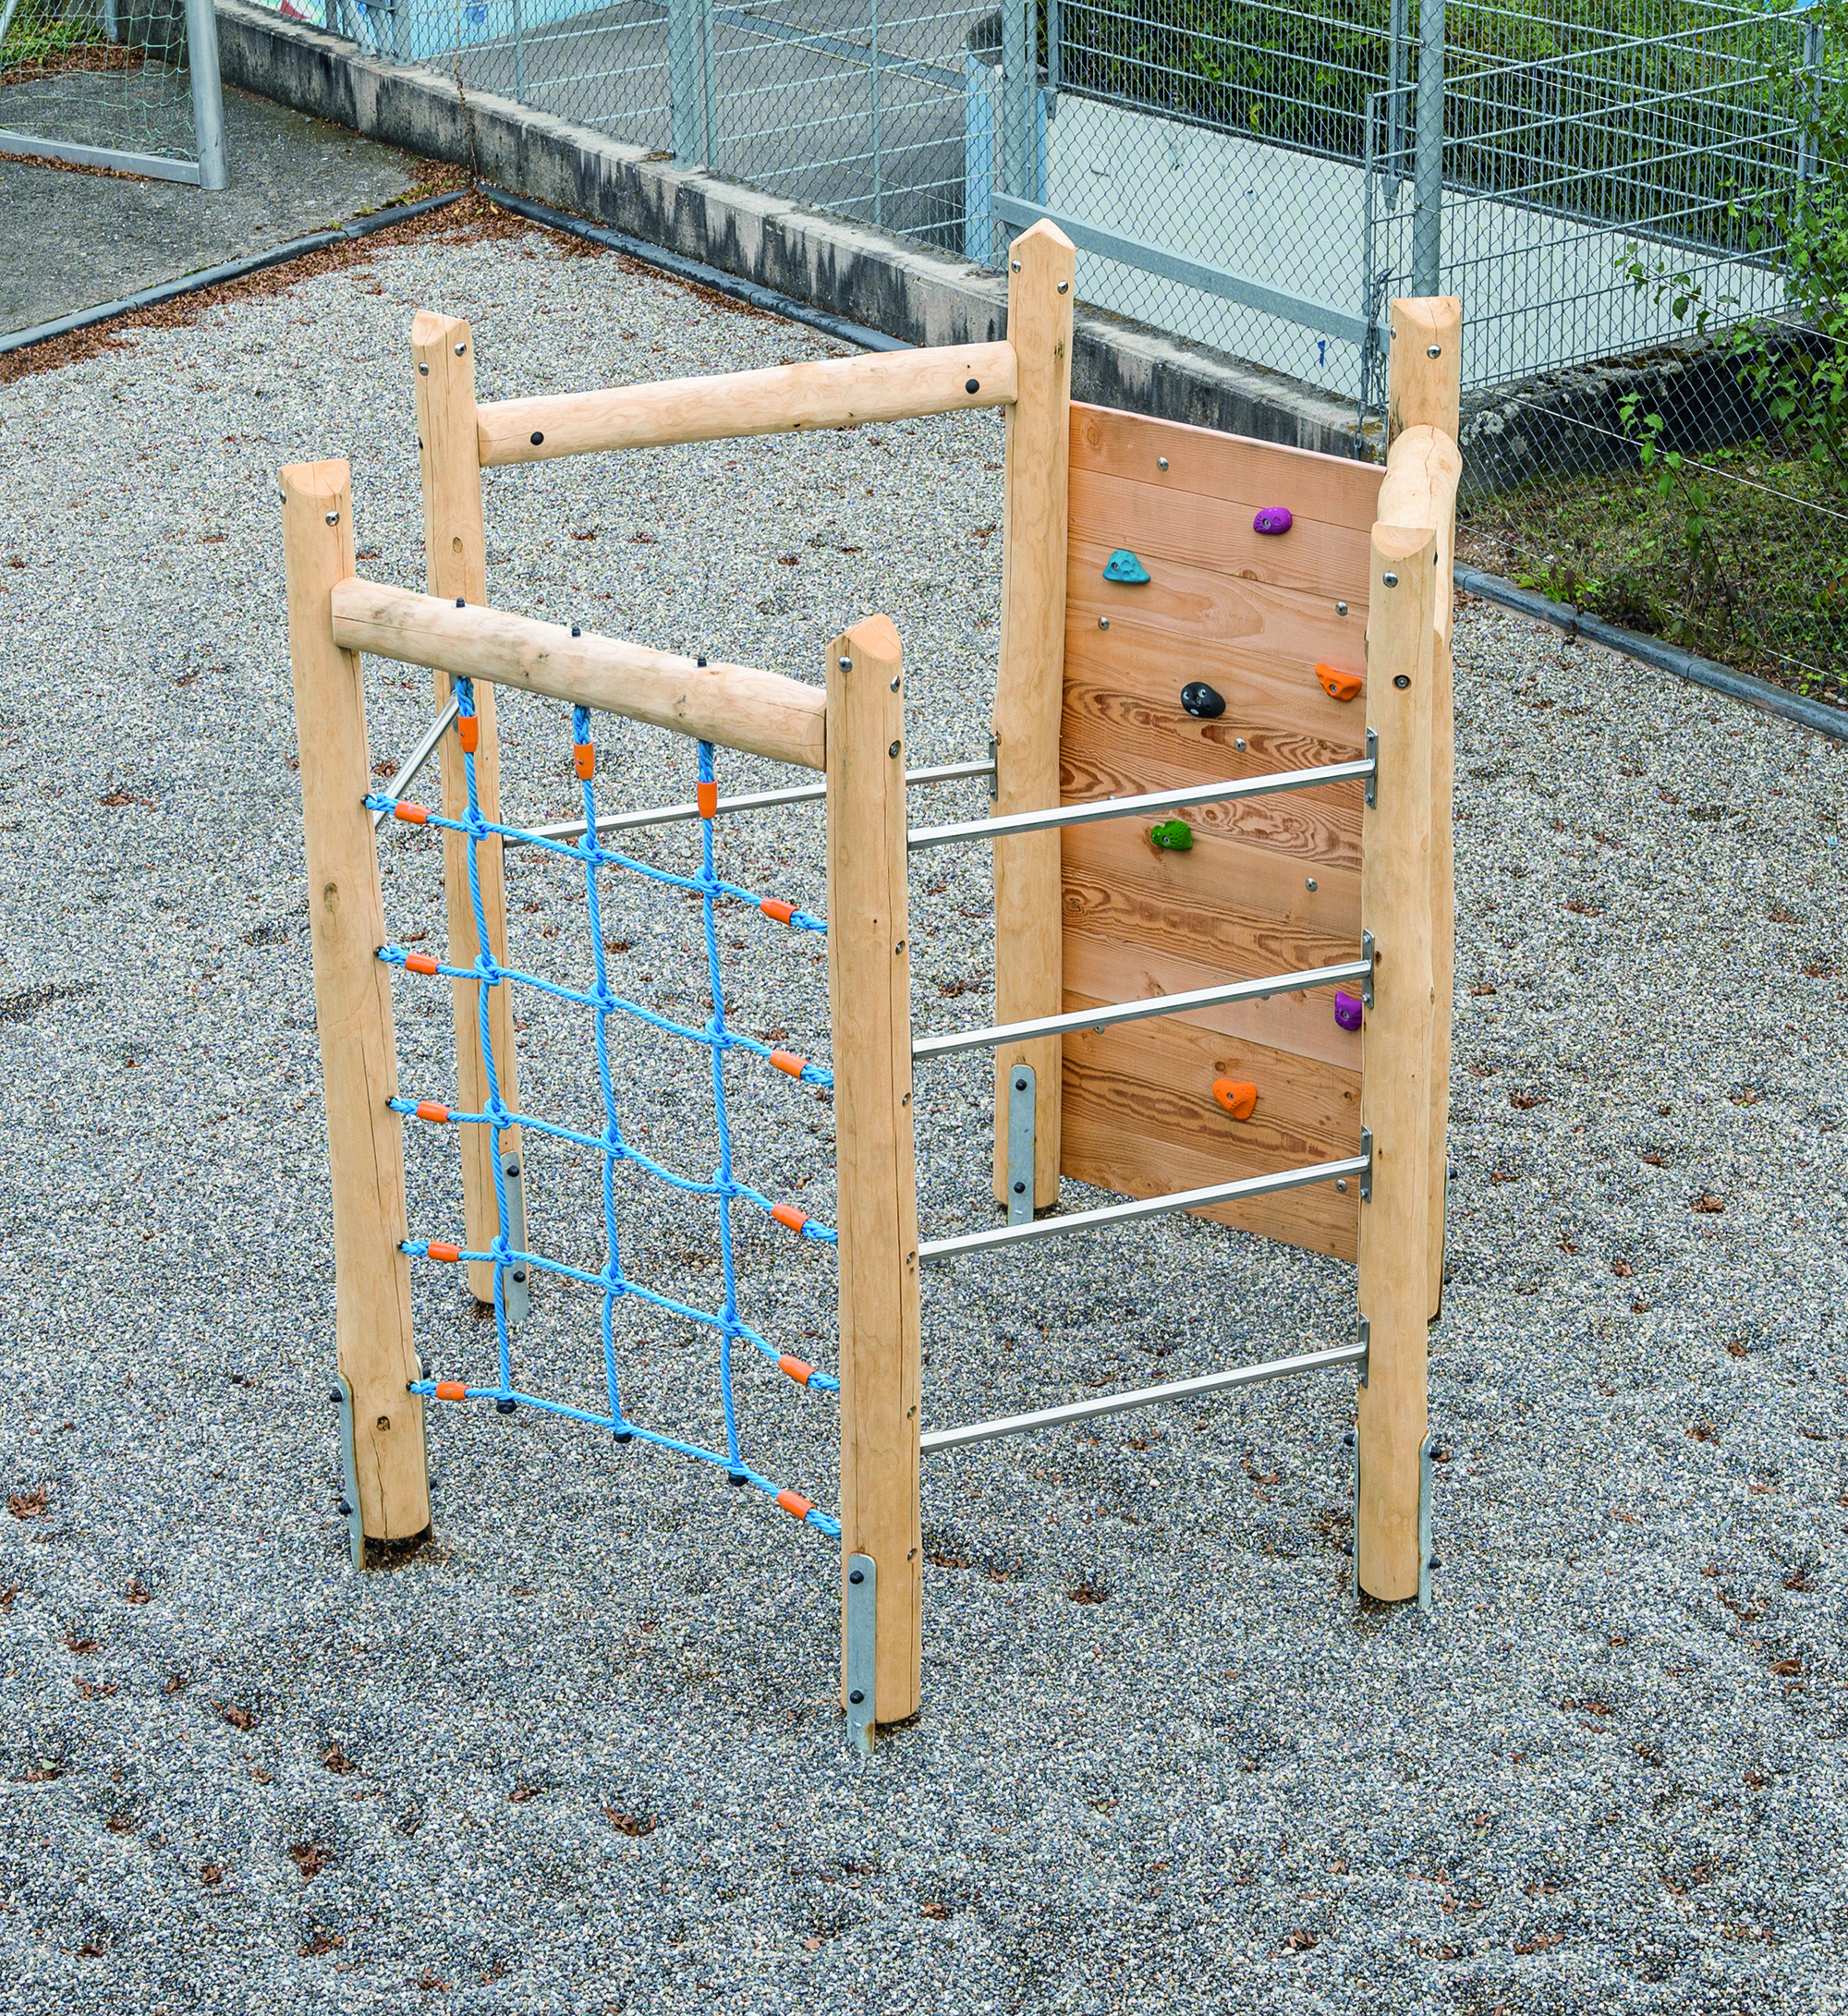 Klettergerüst Robinie : Kombi klettergerät klettergerüst fuchs thun